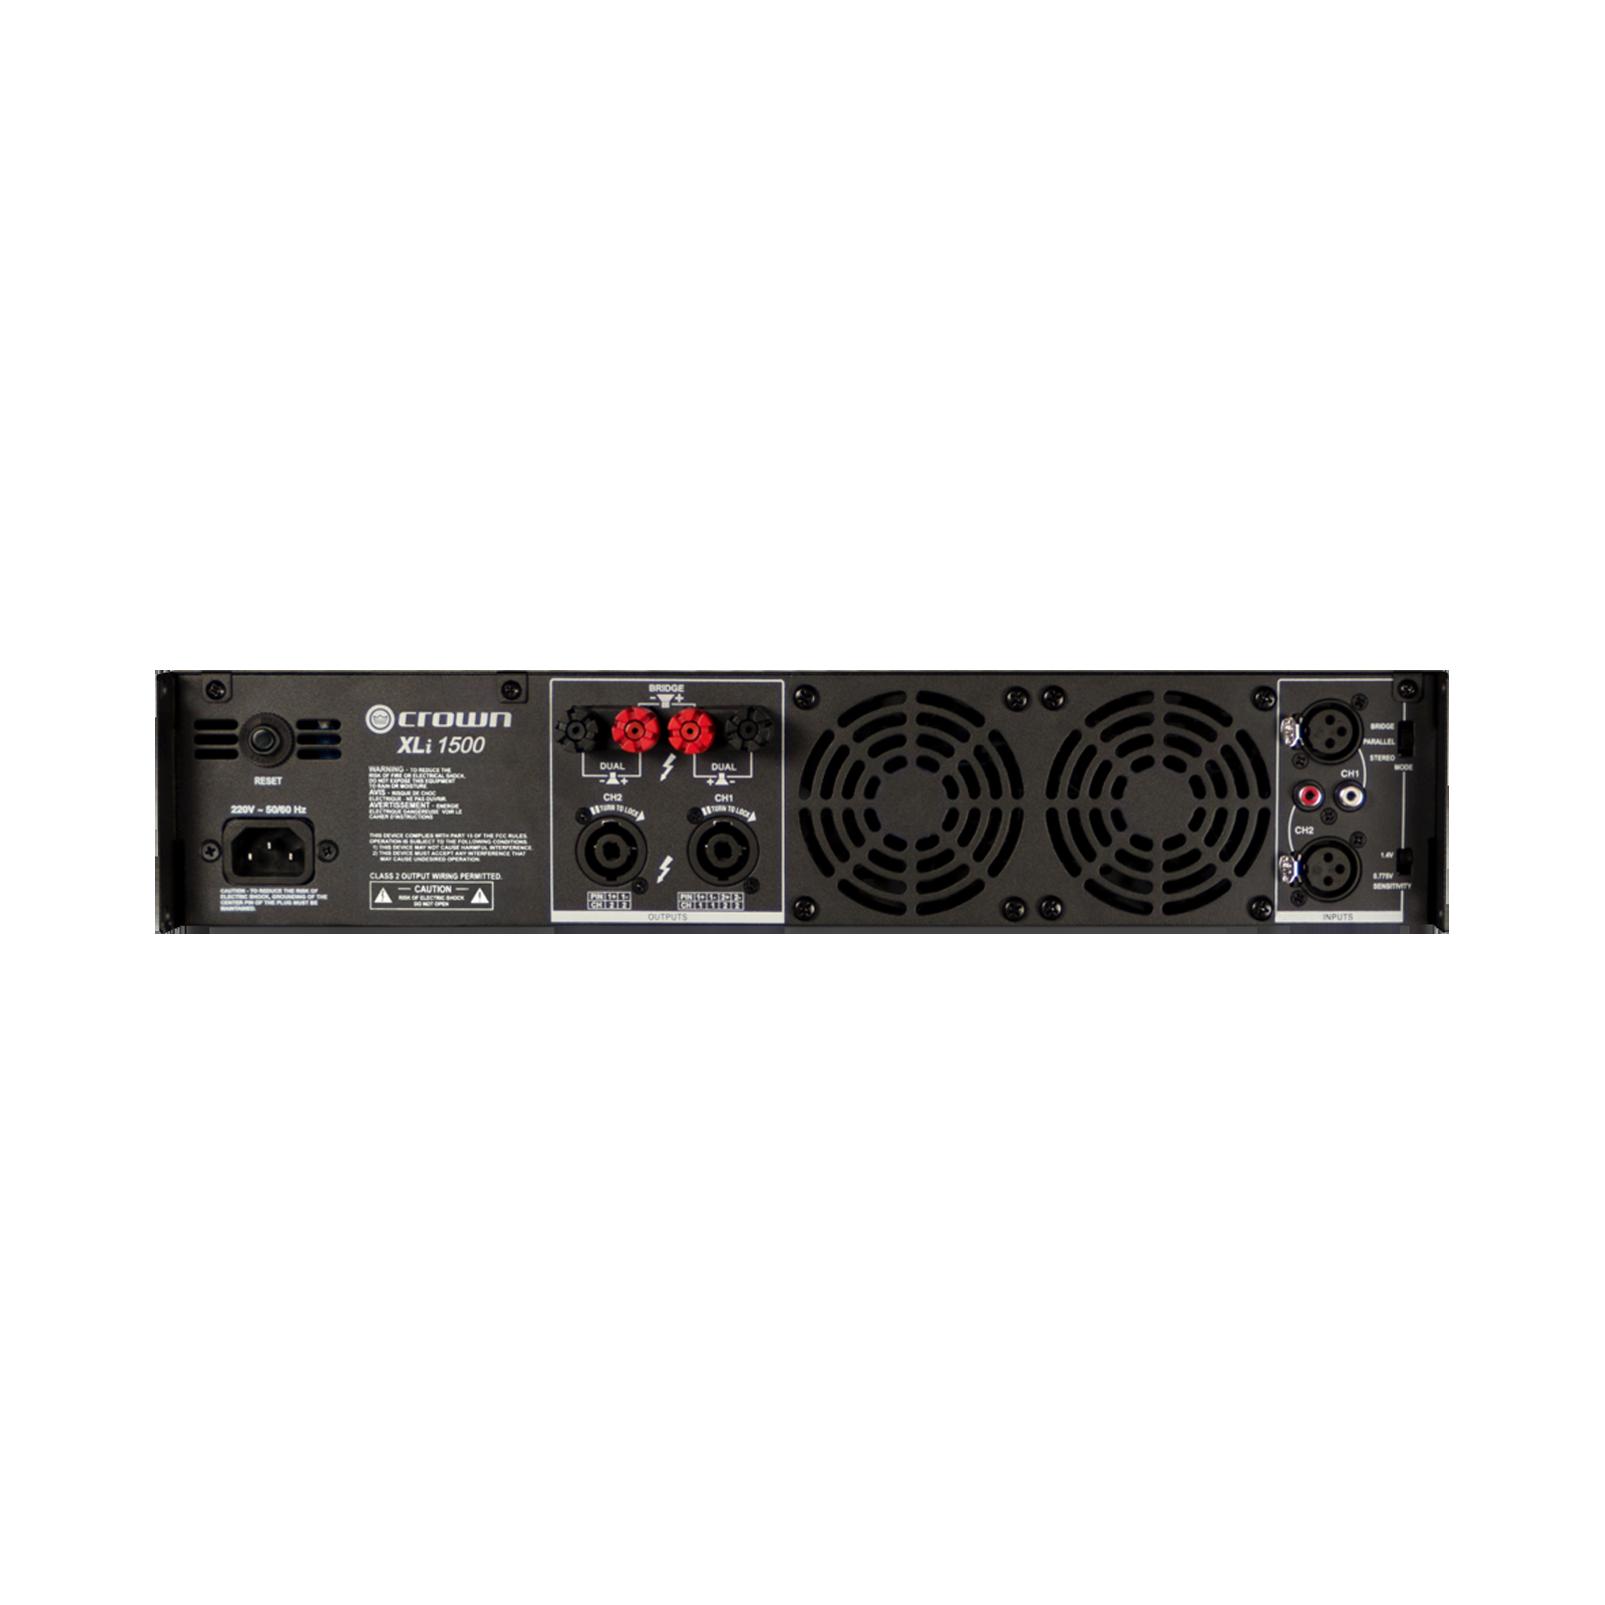 XLi 1500